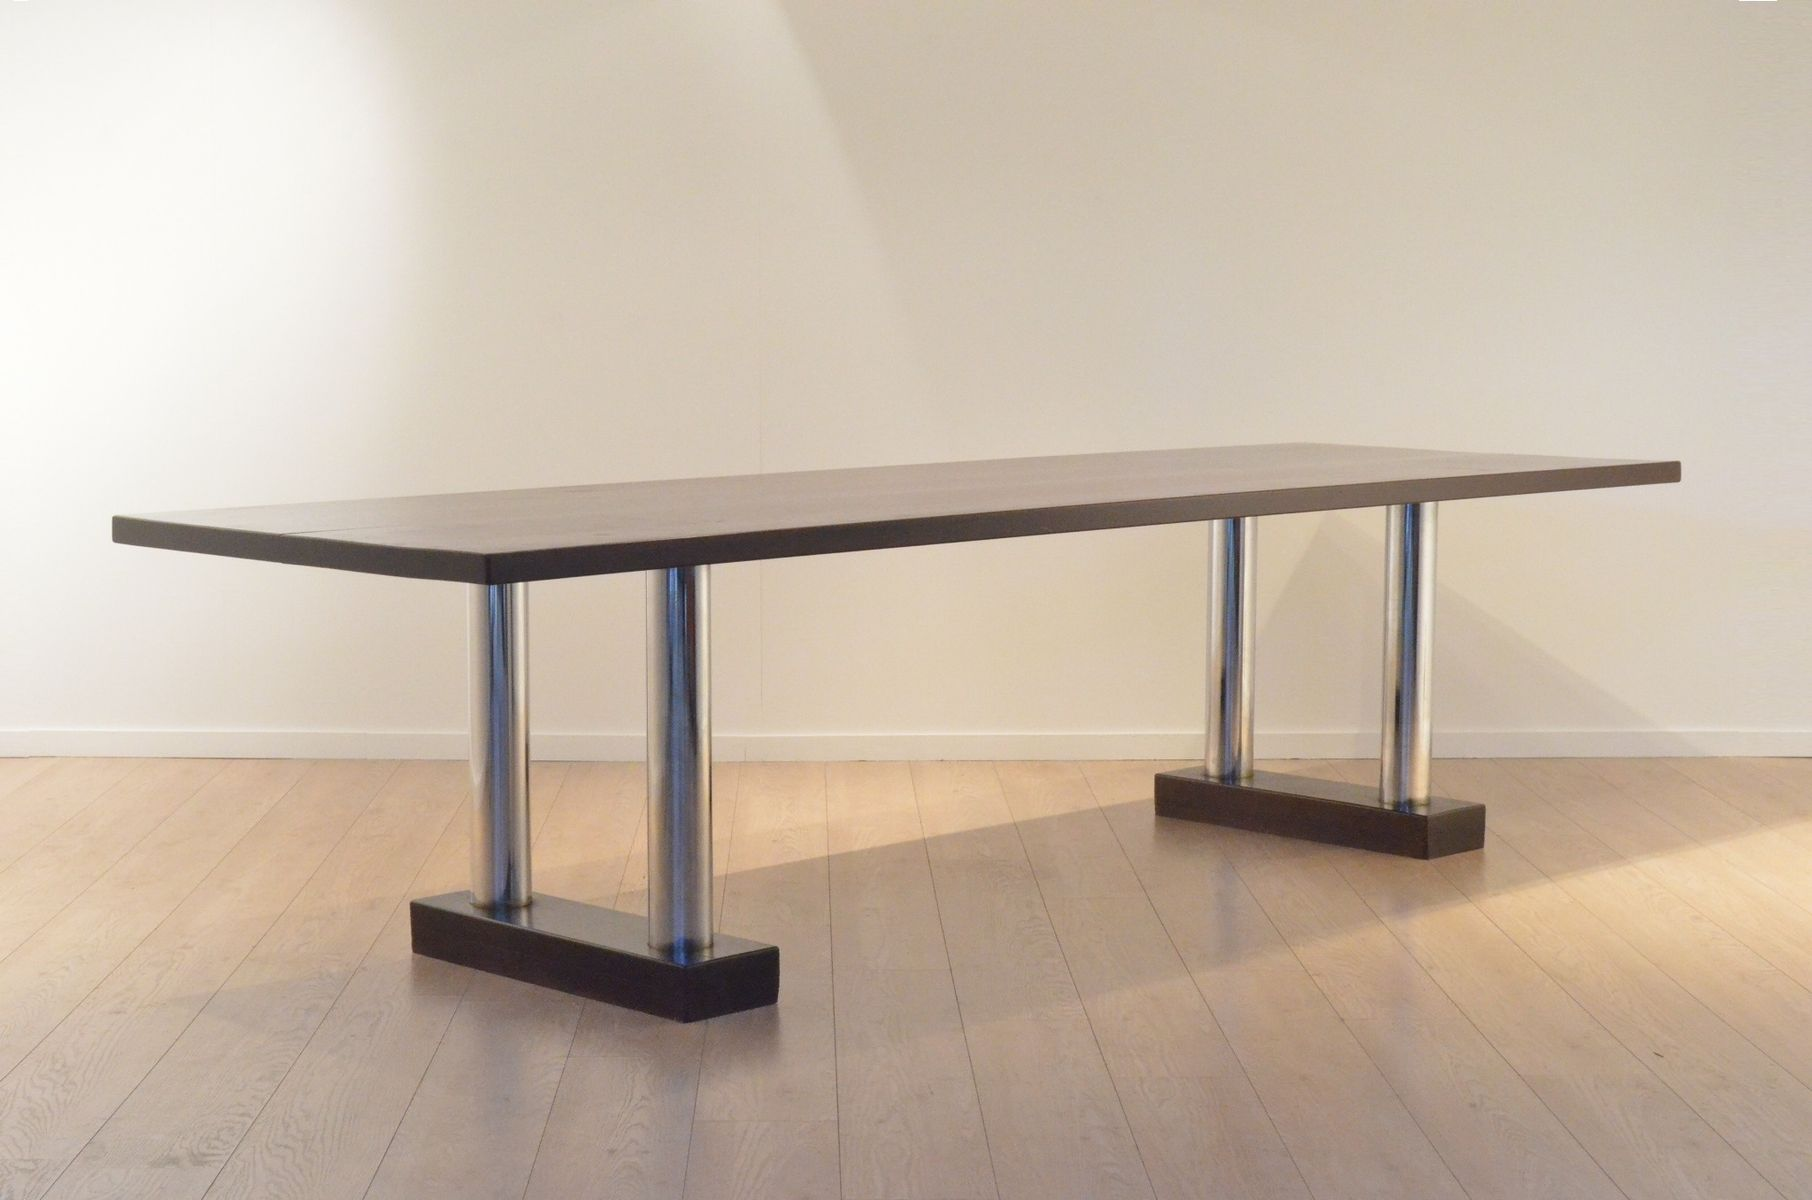 Grande table de salle manger en chrome et weng for Table de salle a manger couleur wenge